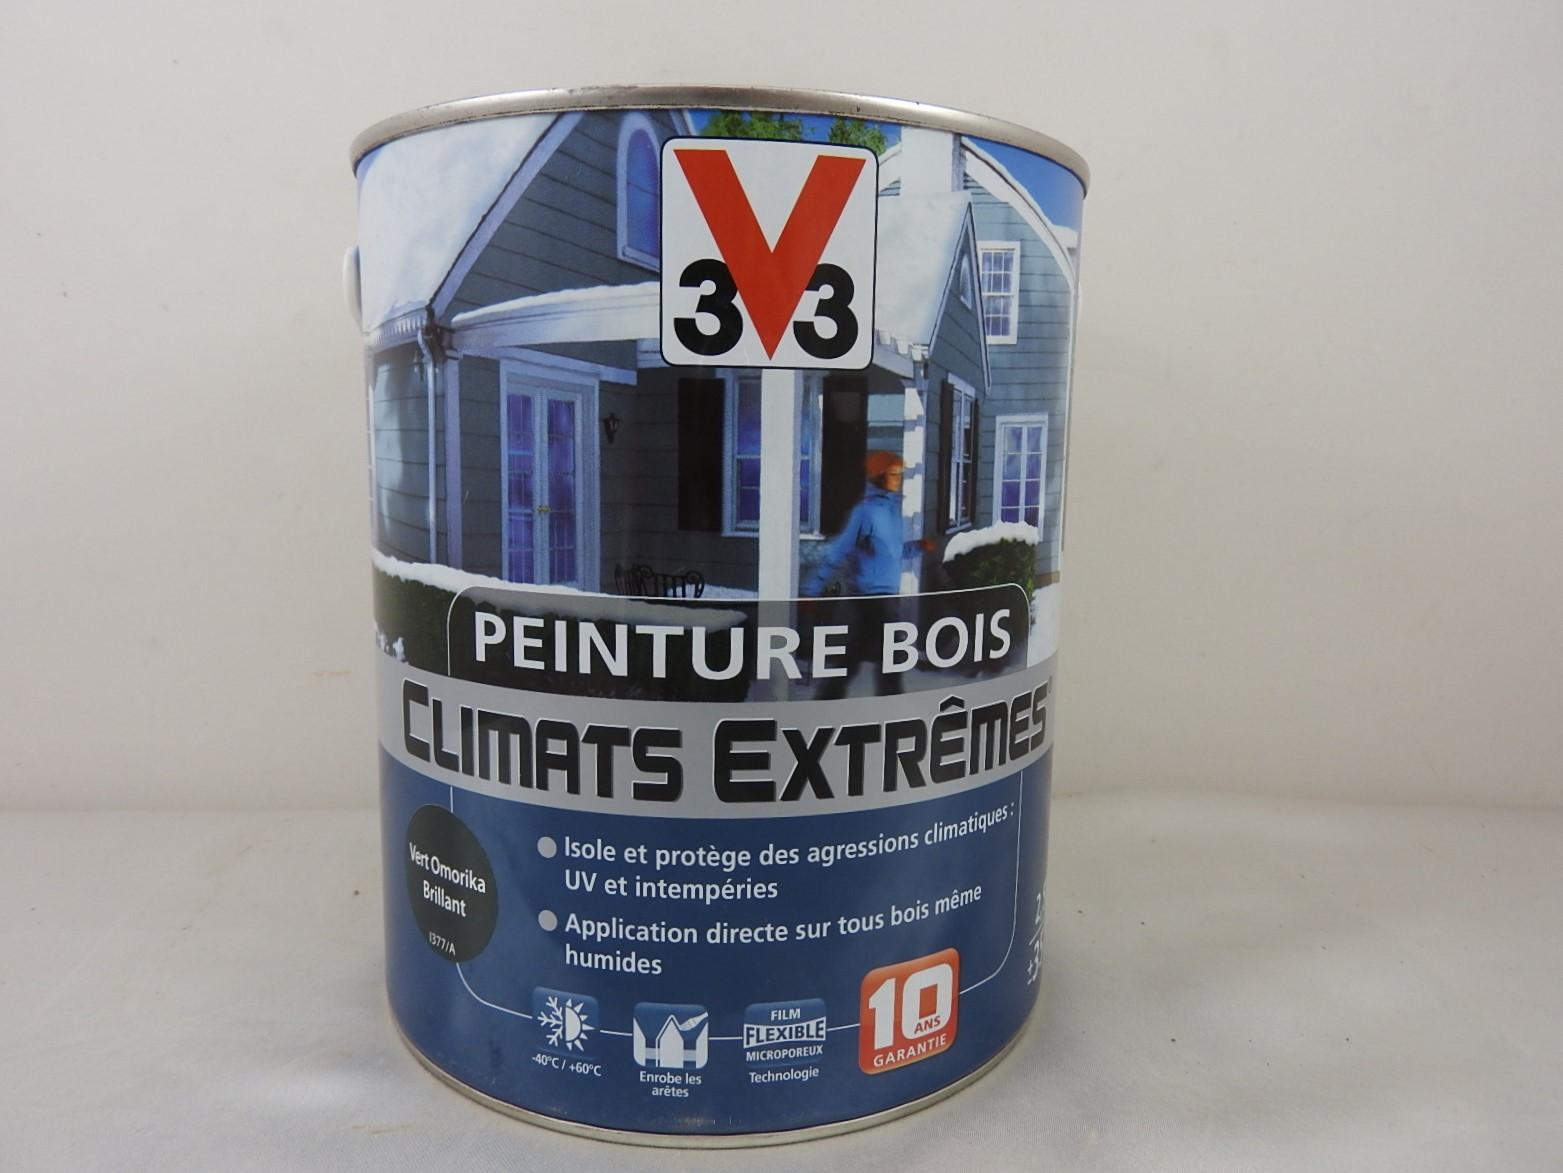 Peinture Bois Climats Extrêmes V33 Brillant 2 5 L V33